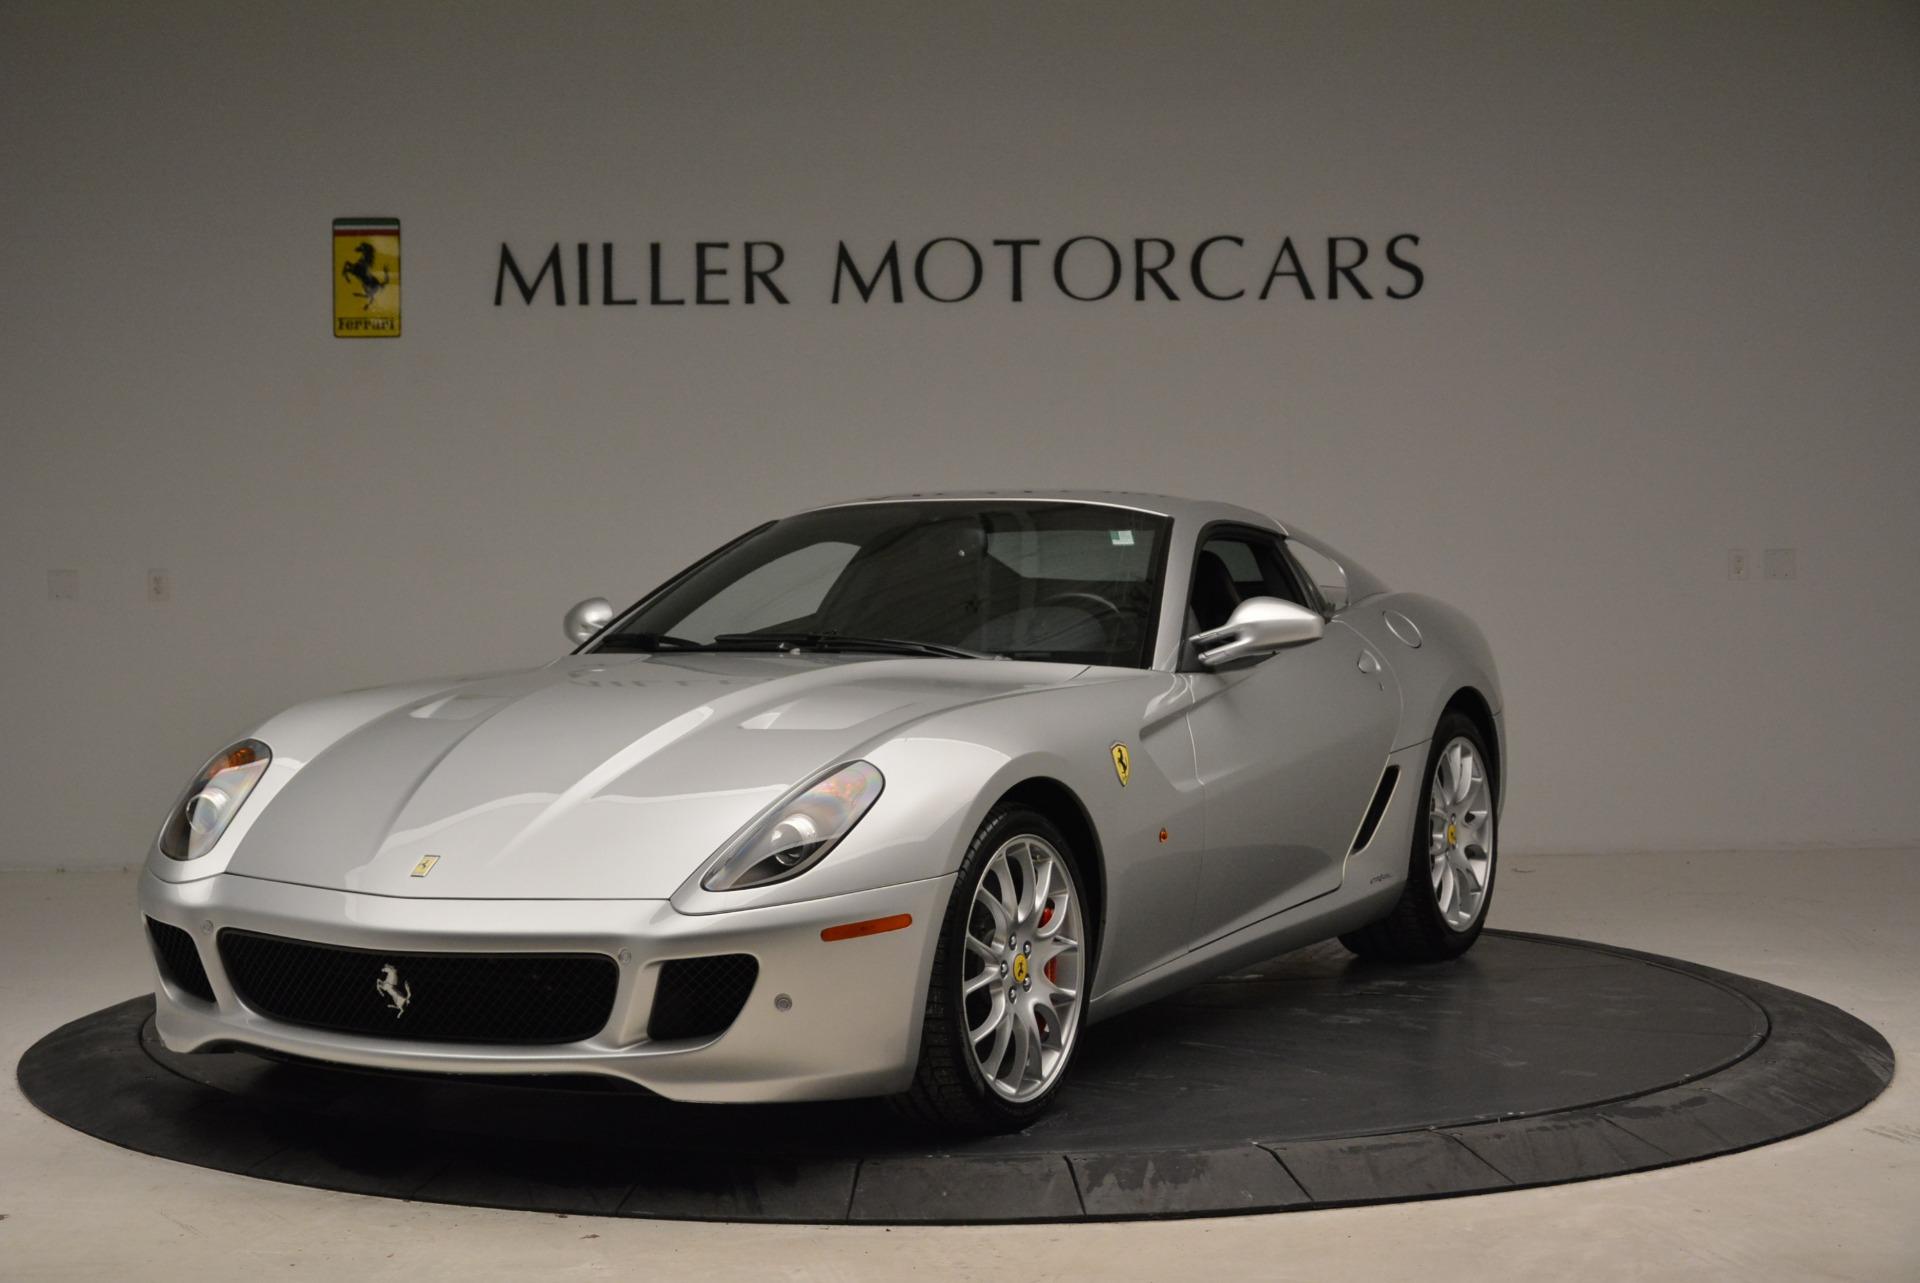 Used 2010 Ferrari 599 GTB Fiorano for sale Sold at McLaren Greenwich in Greenwich CT 06830 1